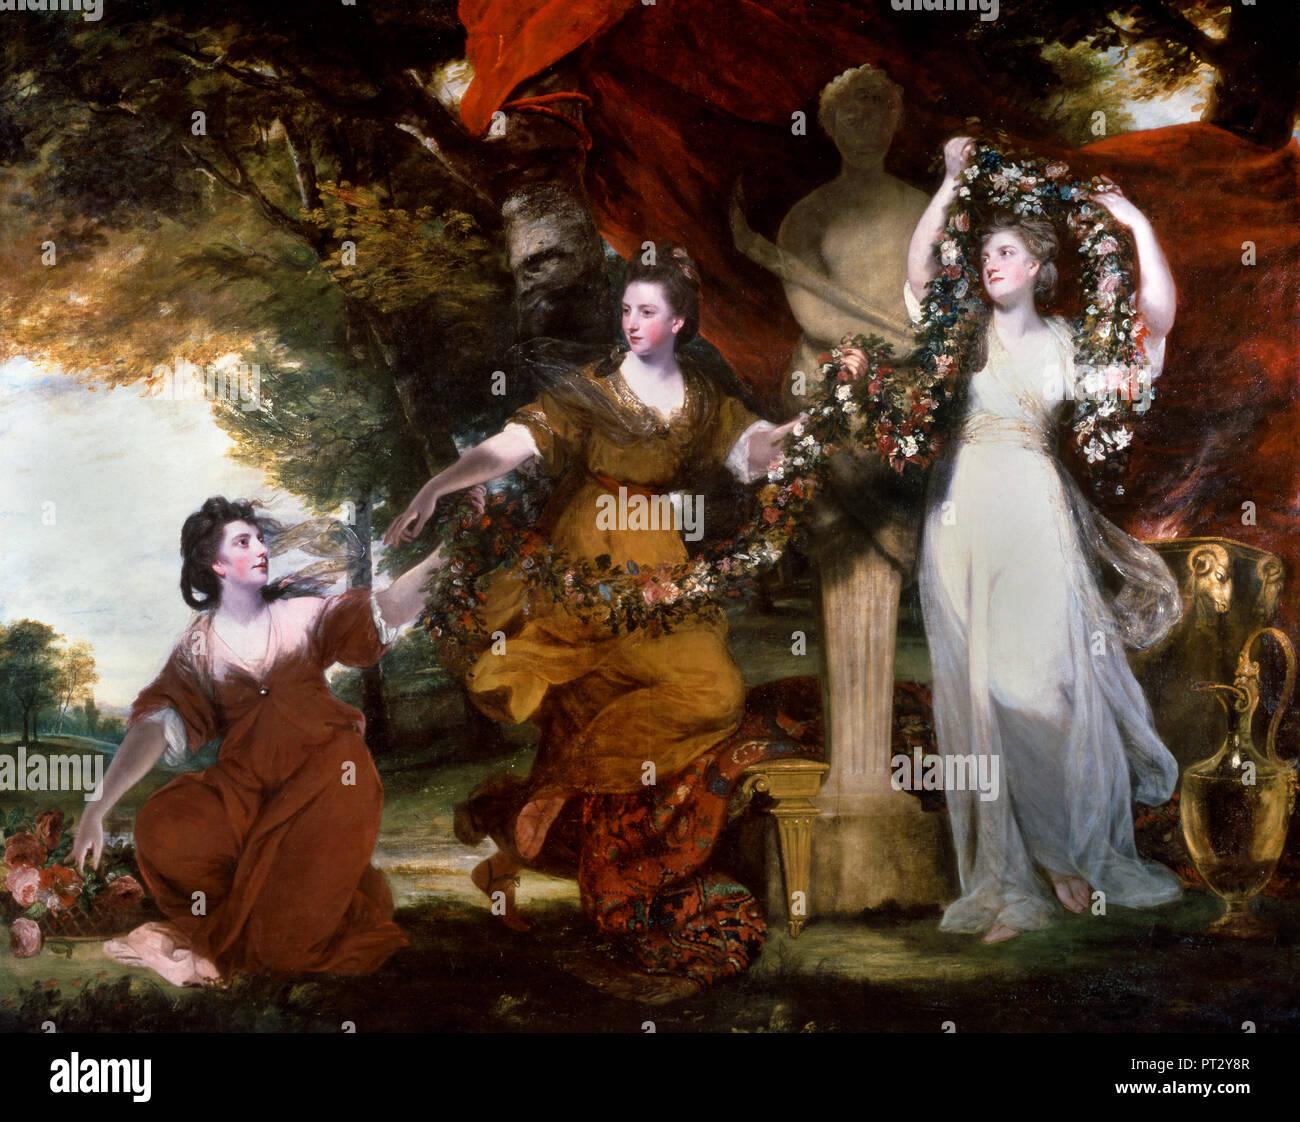 Joshua Reynolds, Three Ladies Adorning a Term of Hymen 1773 Oil on canvas, Tate Britain, London, England. - Stock Image